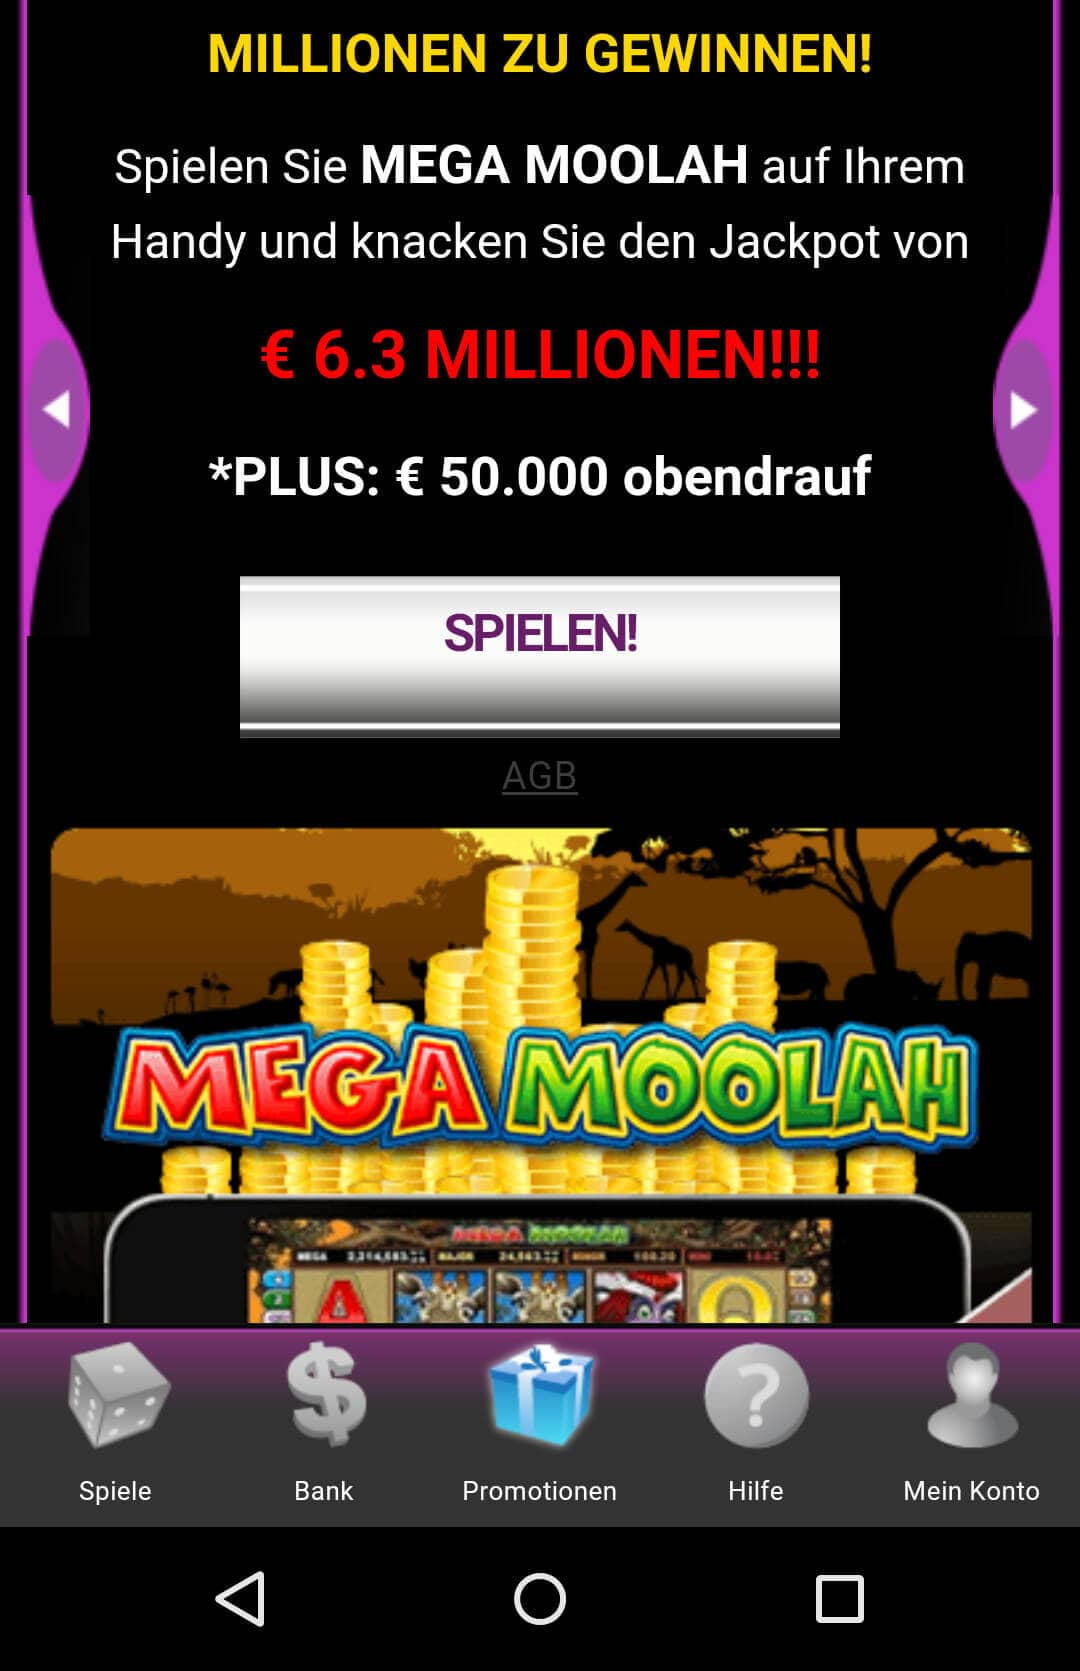 Echtgeld online casino app cd slot mount for garmin sat nav